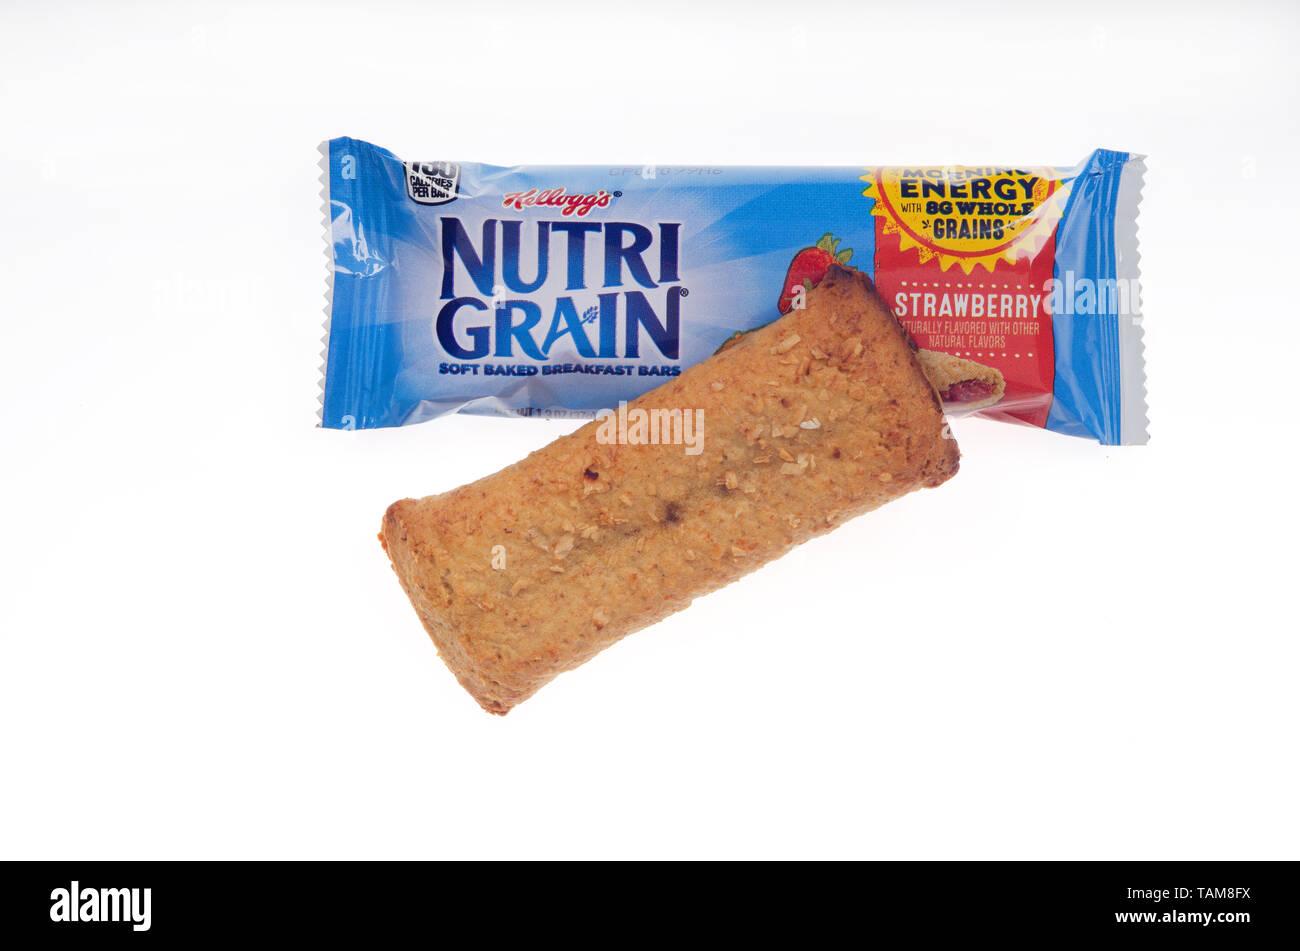 Kellogg's Nutrigrain Strawberry breakfast cereal bar - Stock Image